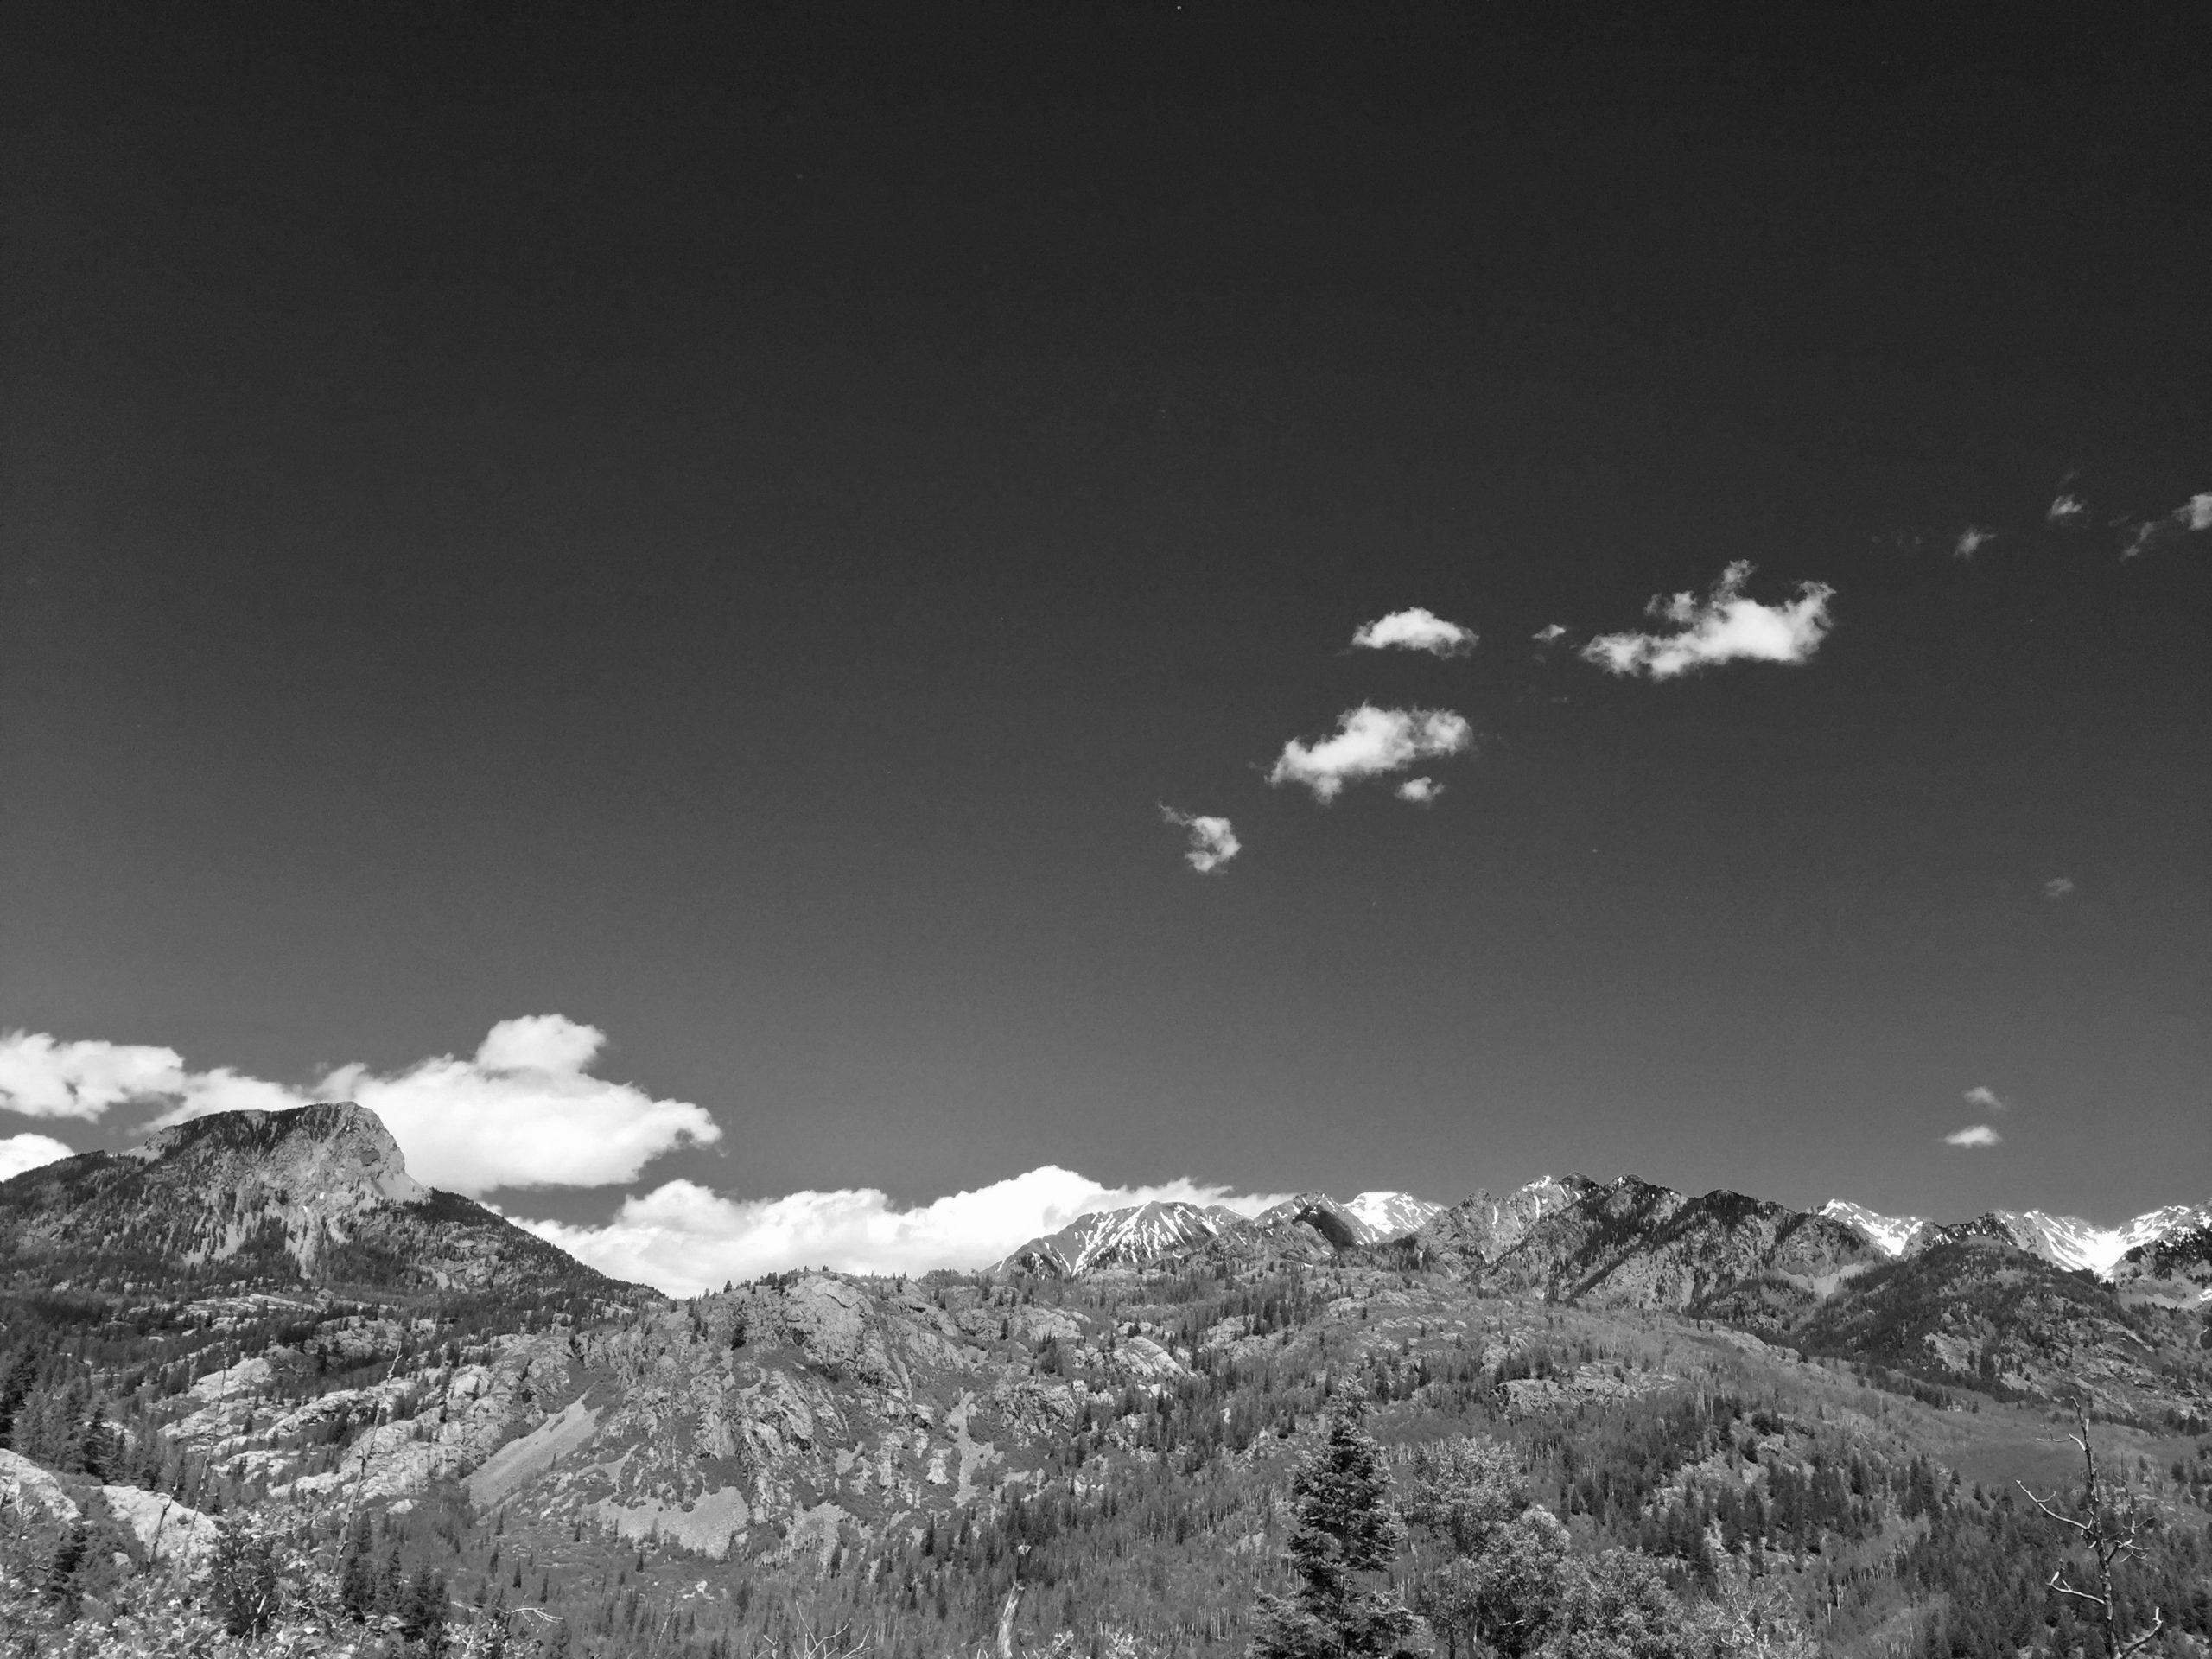 The Durango Wordsmith at Engineer Mountain